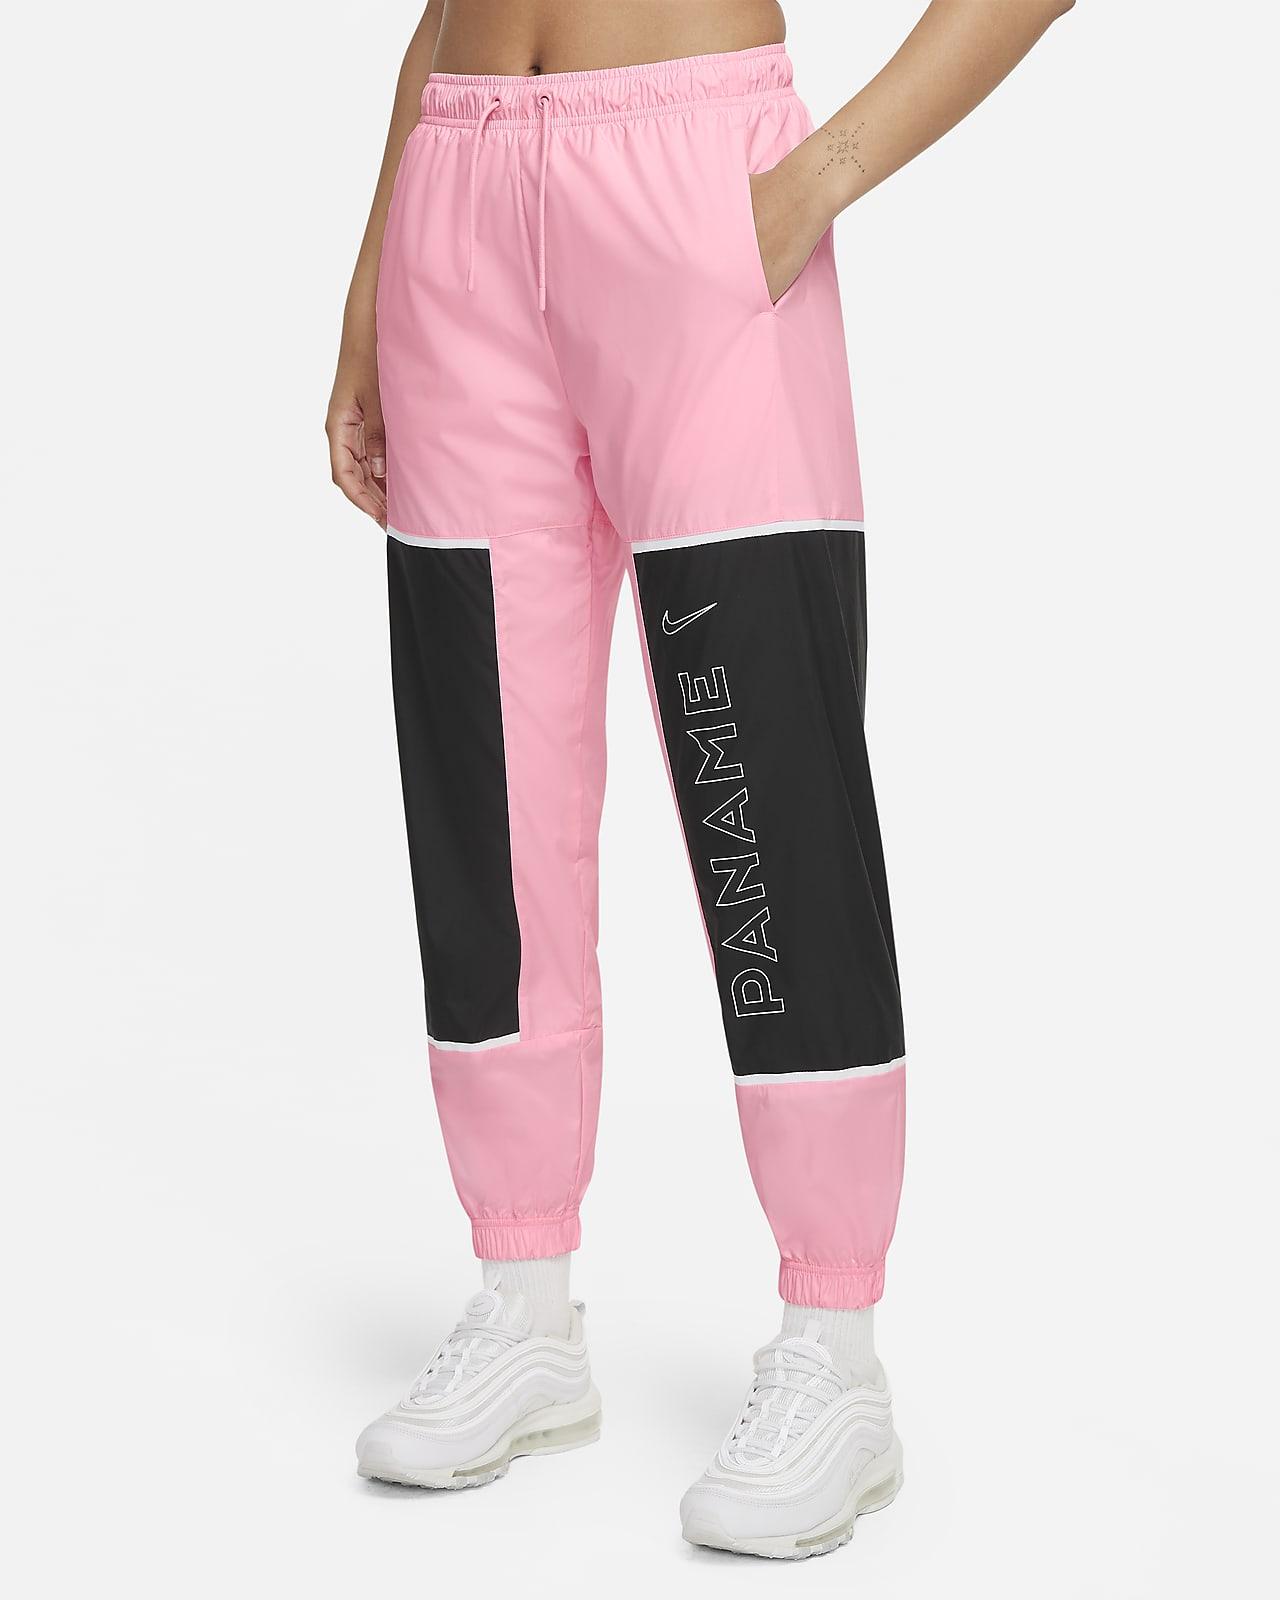 Paris Saint-Germain Women's Woven Football Pants